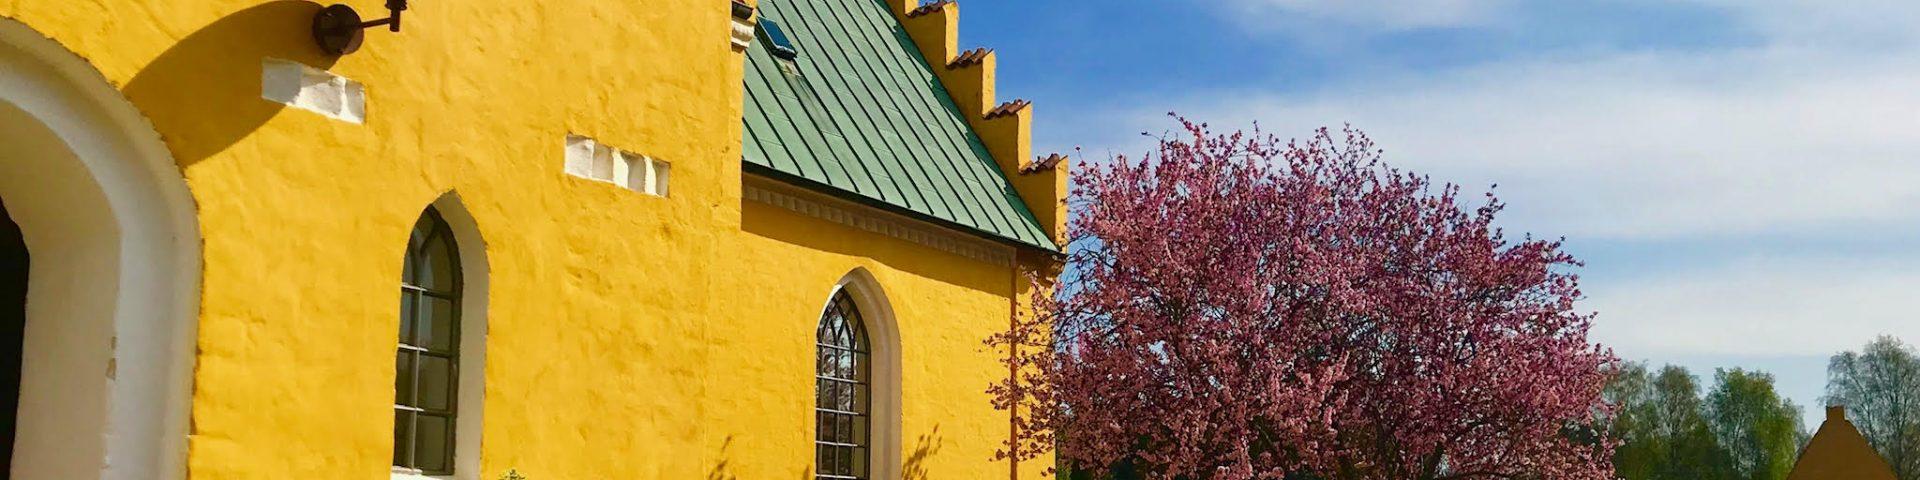 Kirche nykøbing